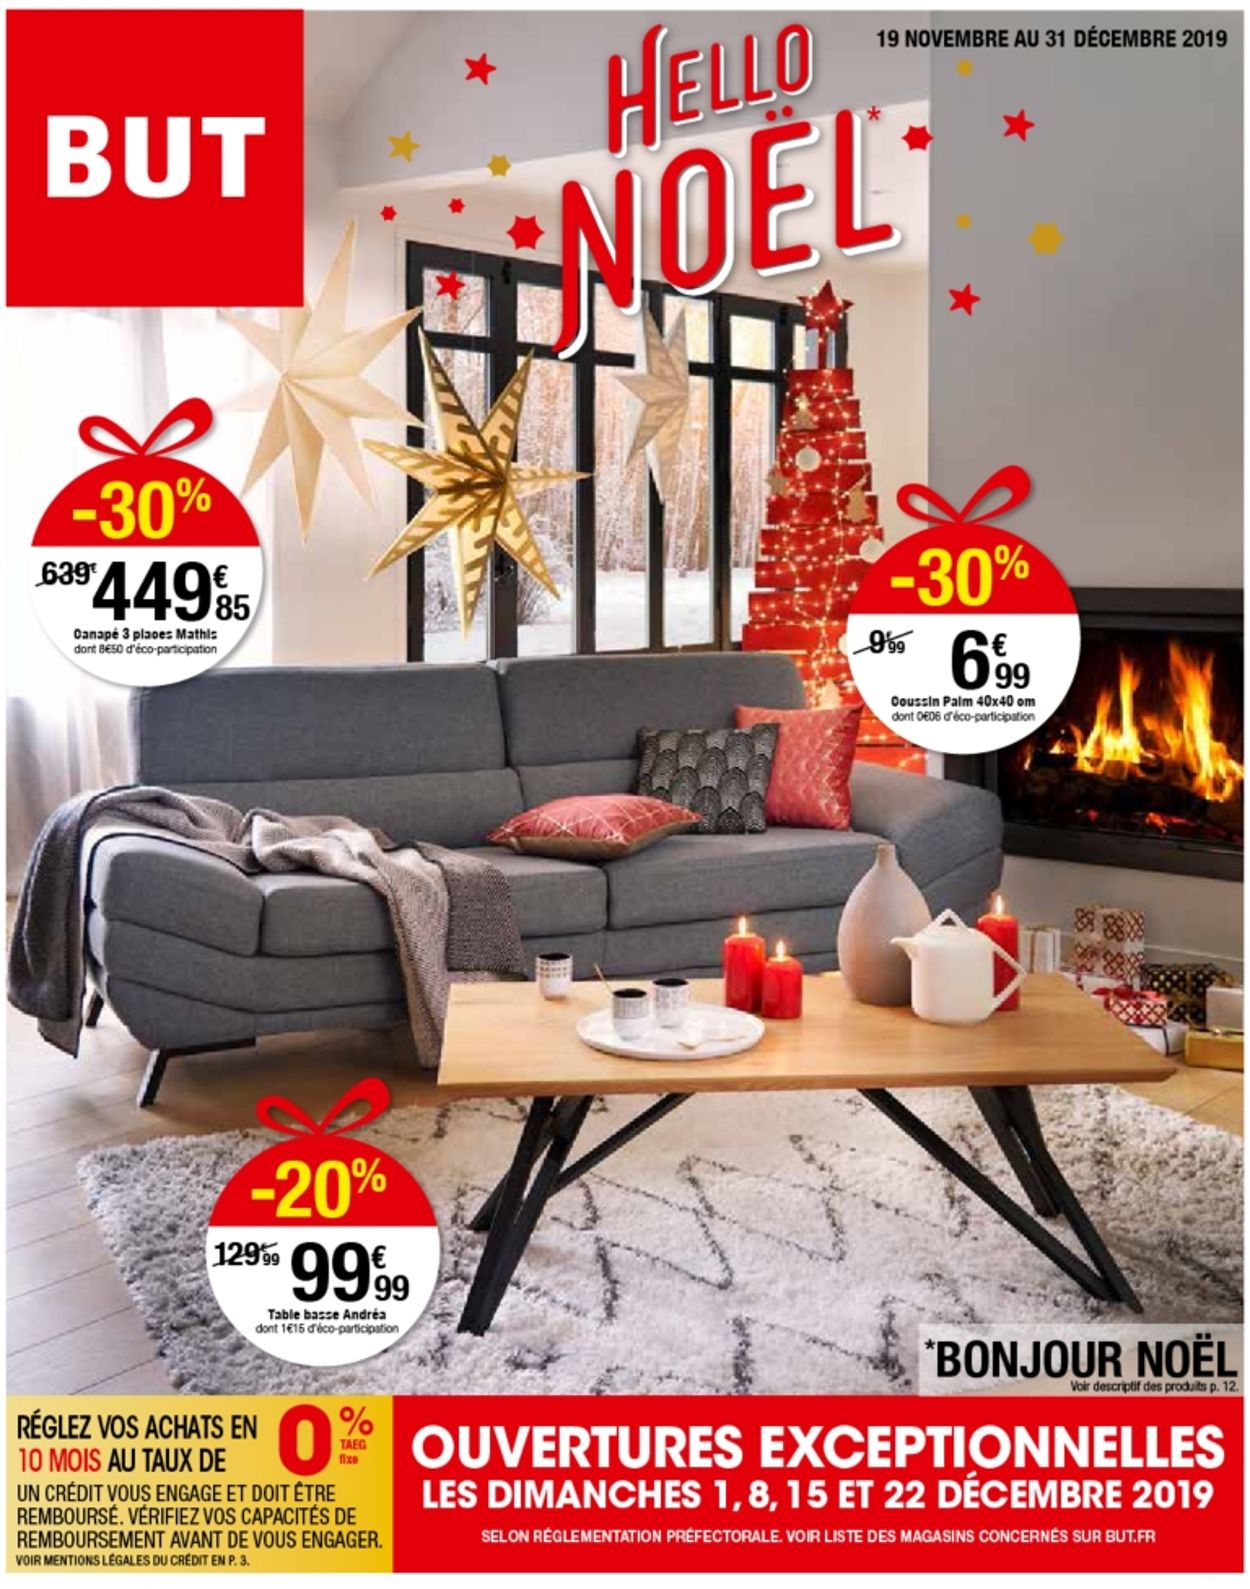 But catalogue de Noël 2019 Catalogue - 19.11-31.12.2019